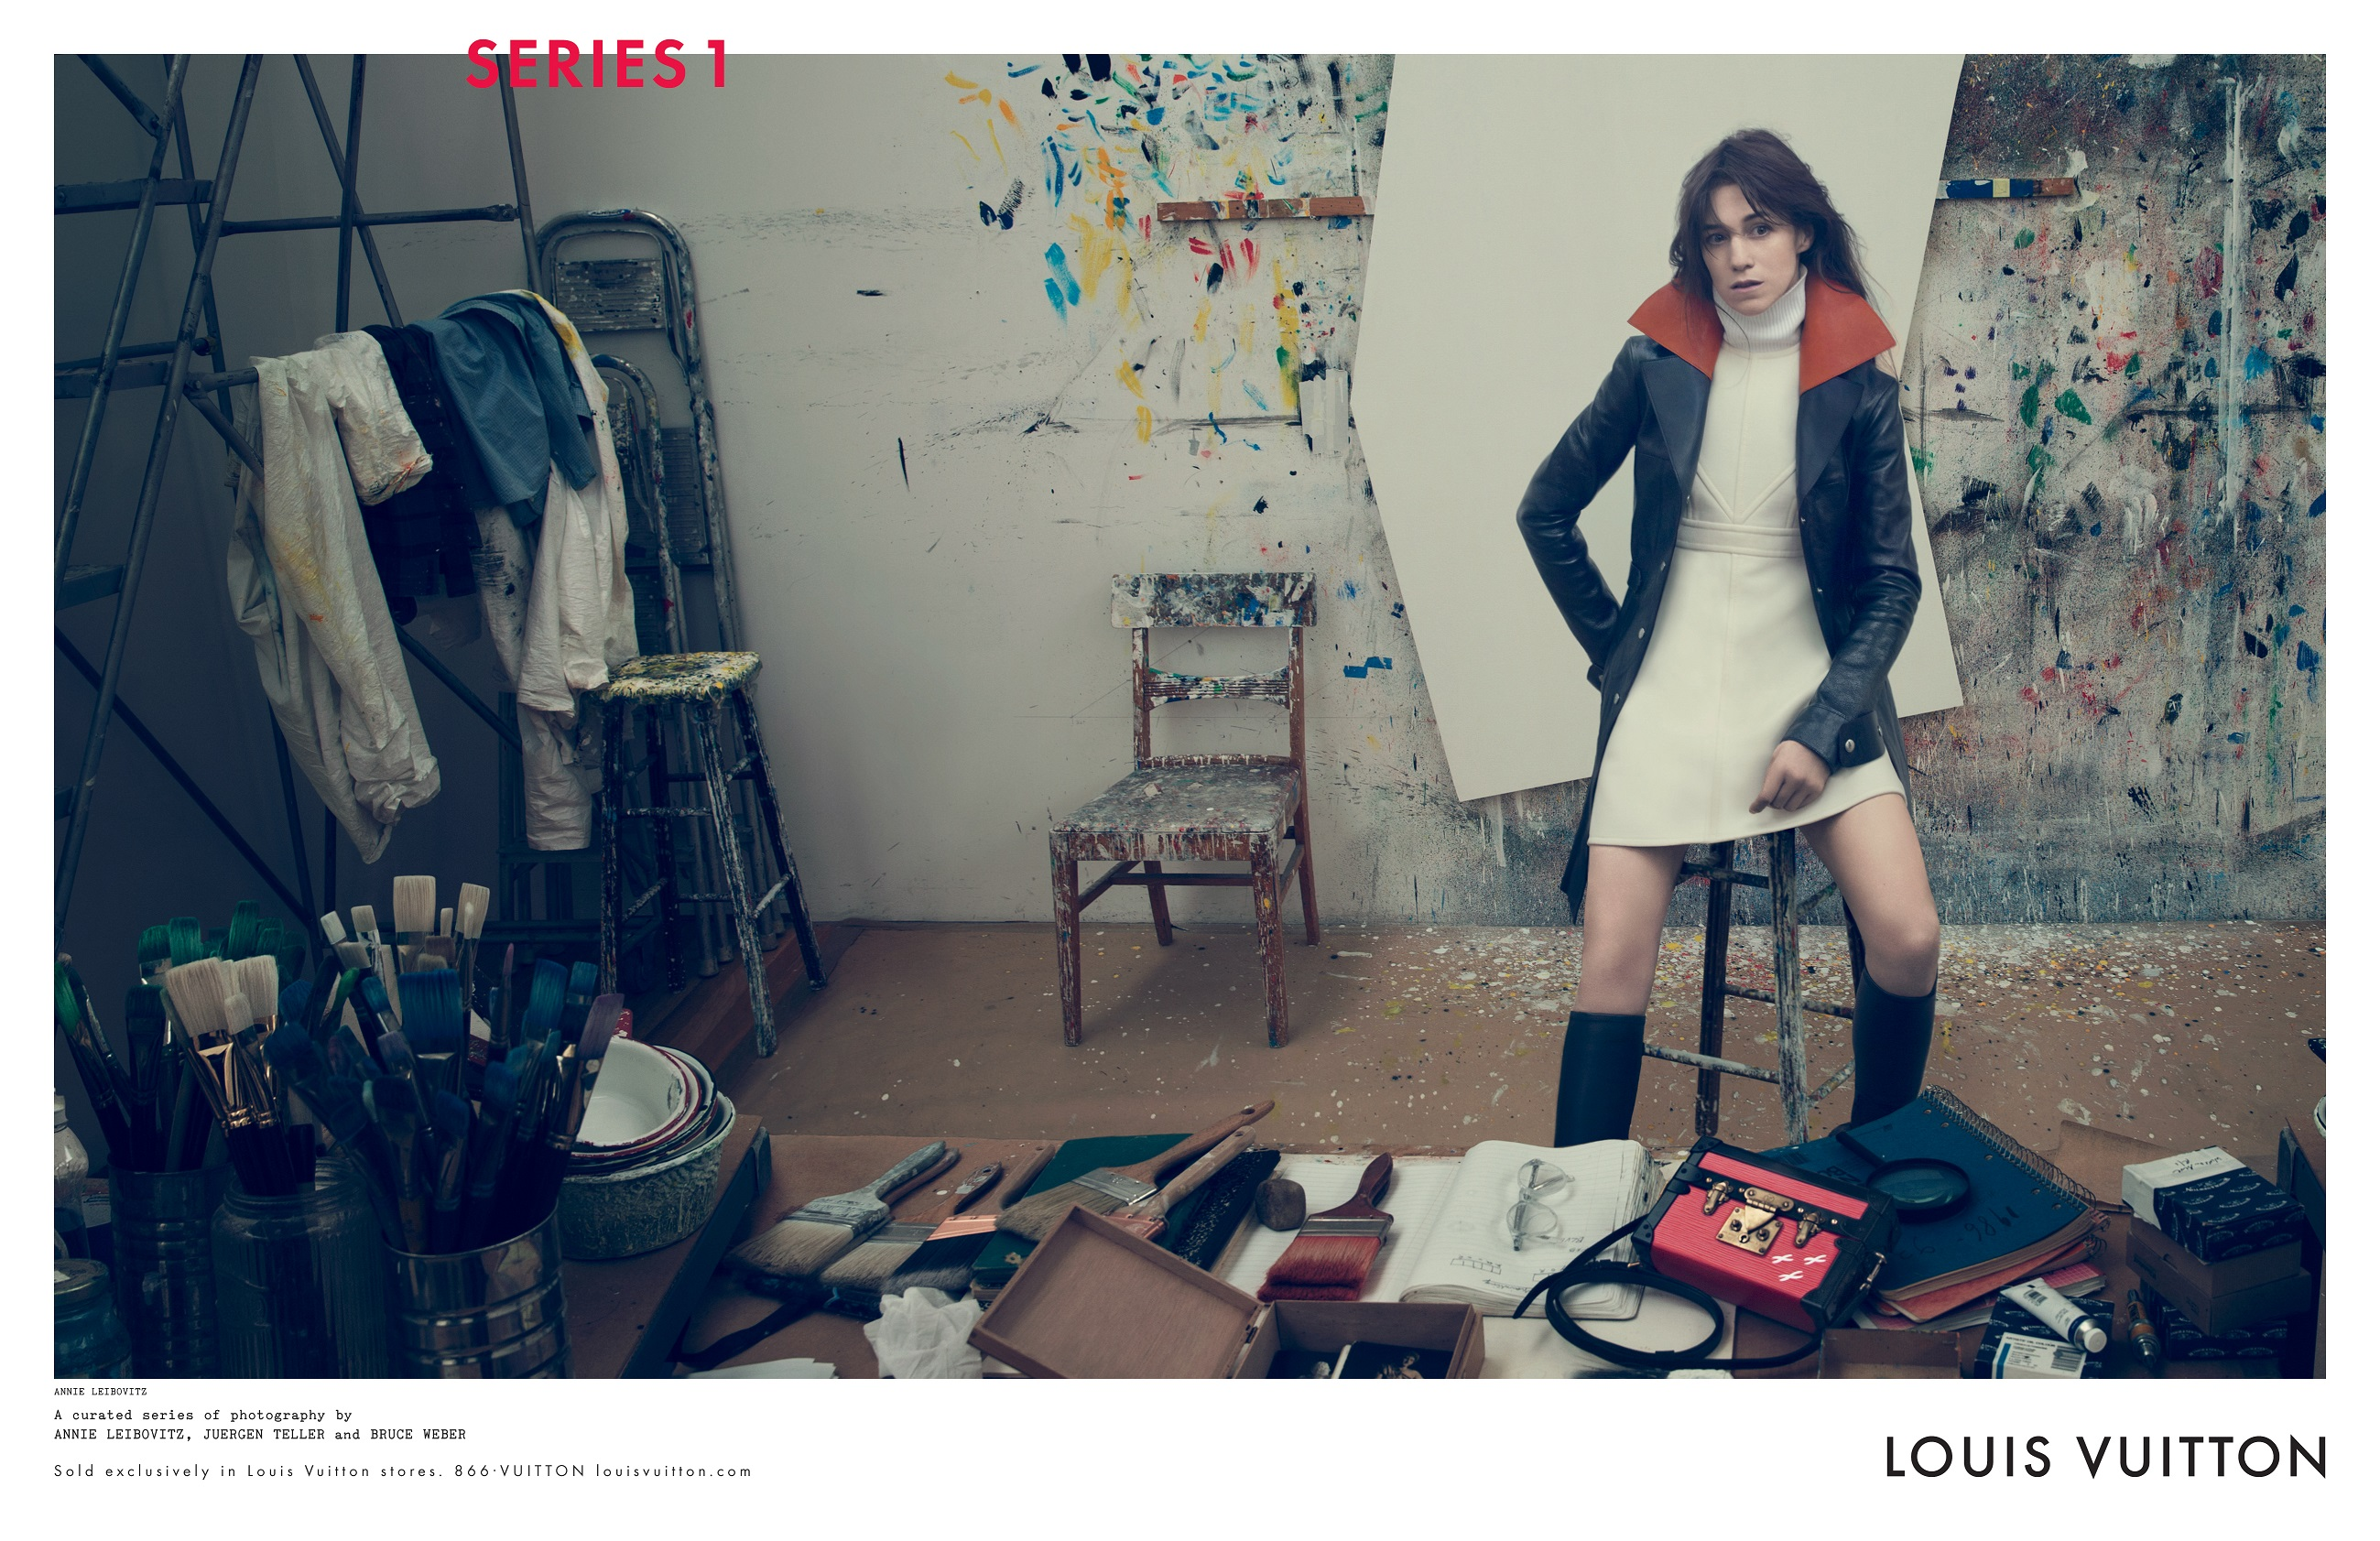 Louis Vuitton Fall Winter 2014 Campaign